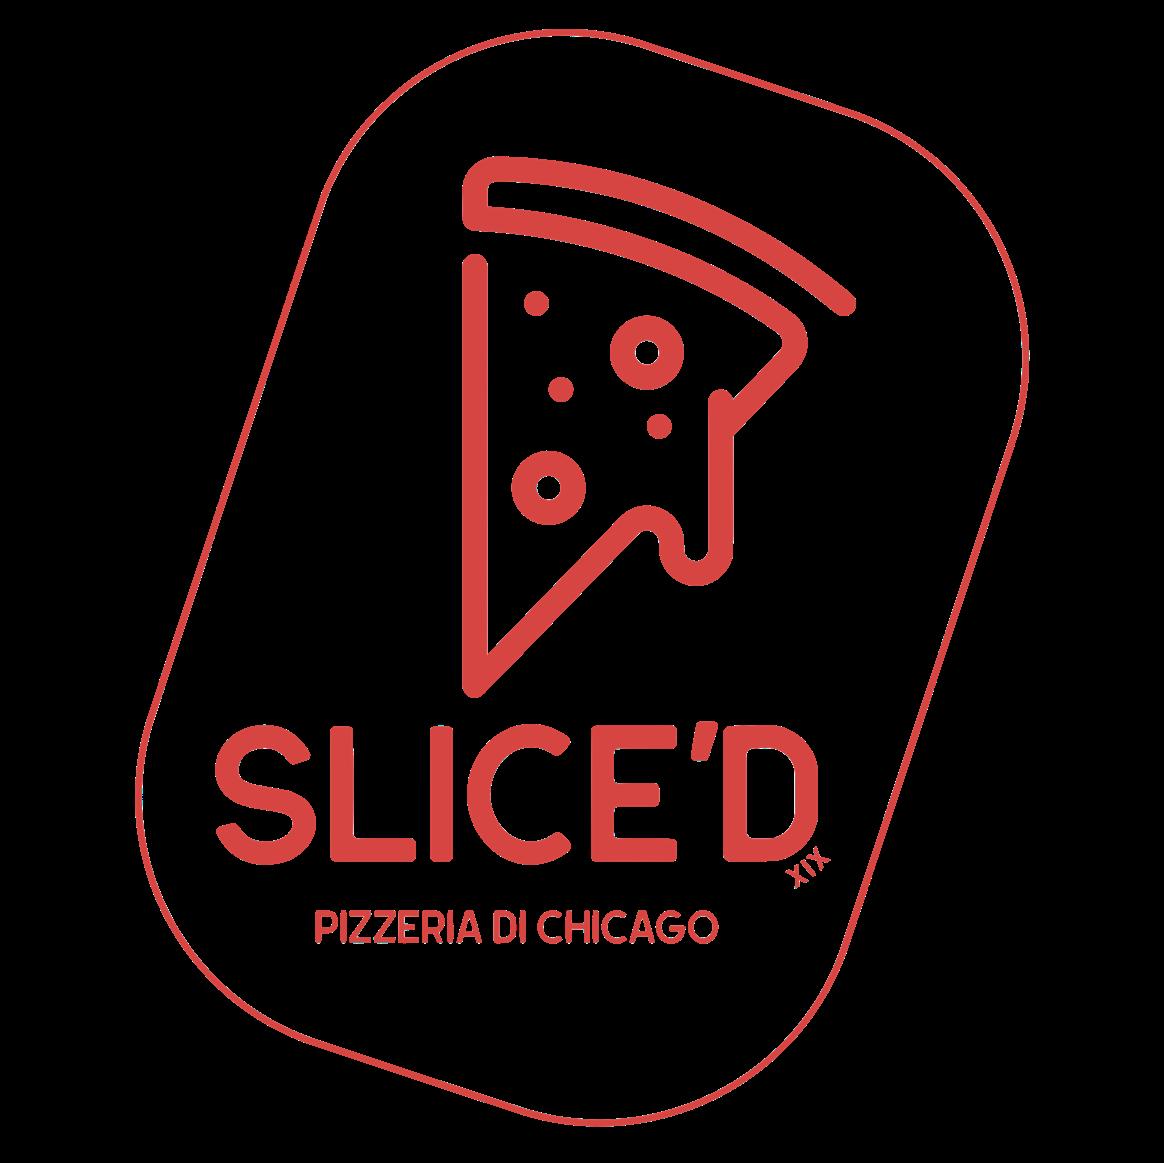 Red slice'd pizzeria logo